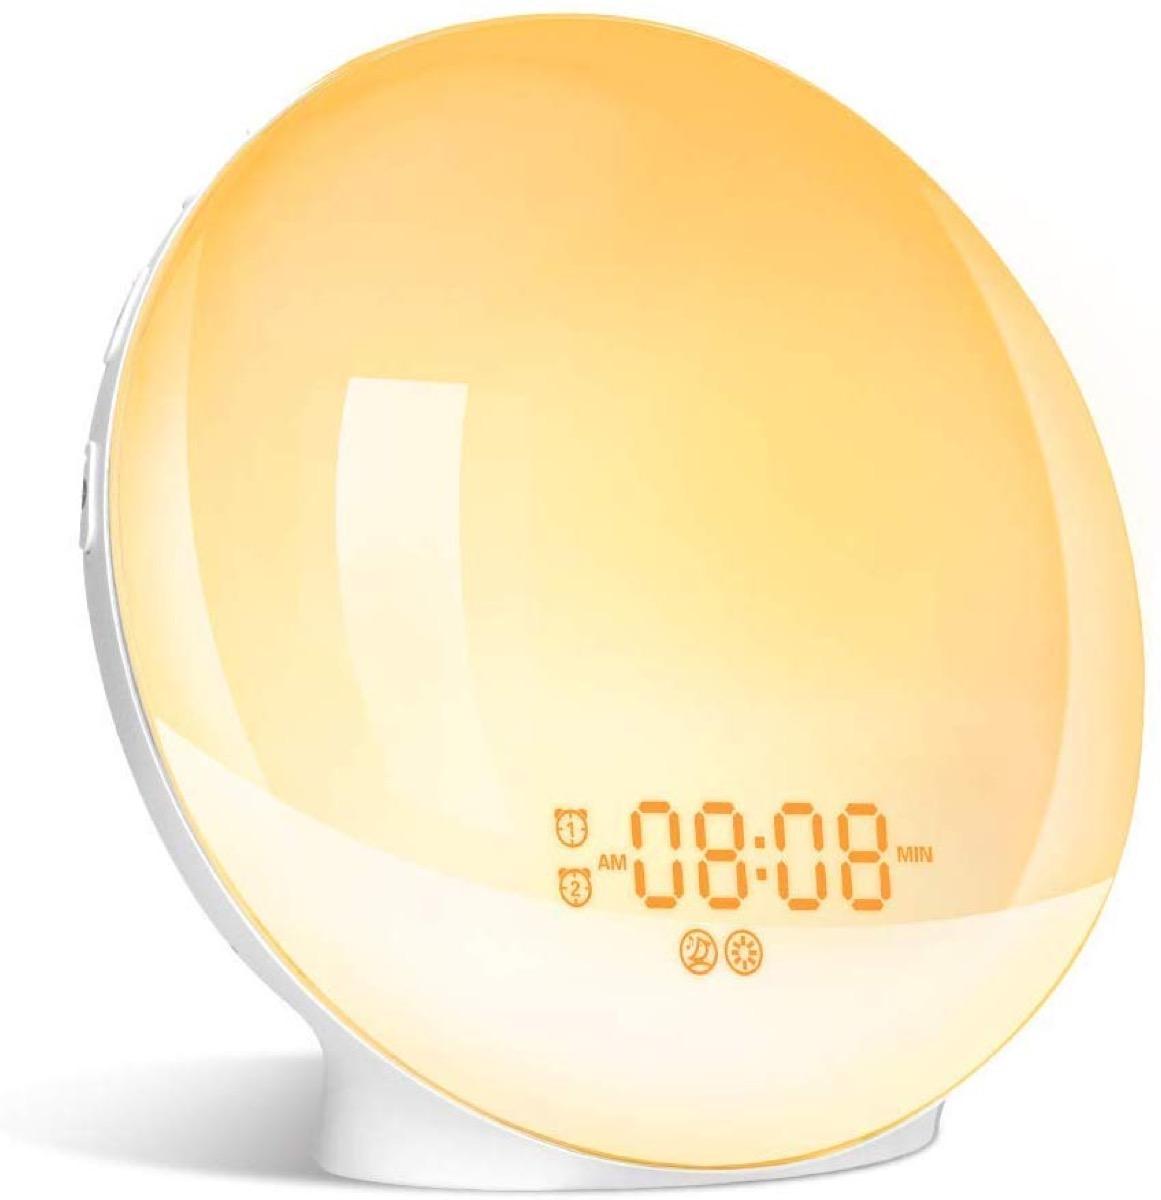 phillips wake up light with yellow light, better sleep essentials